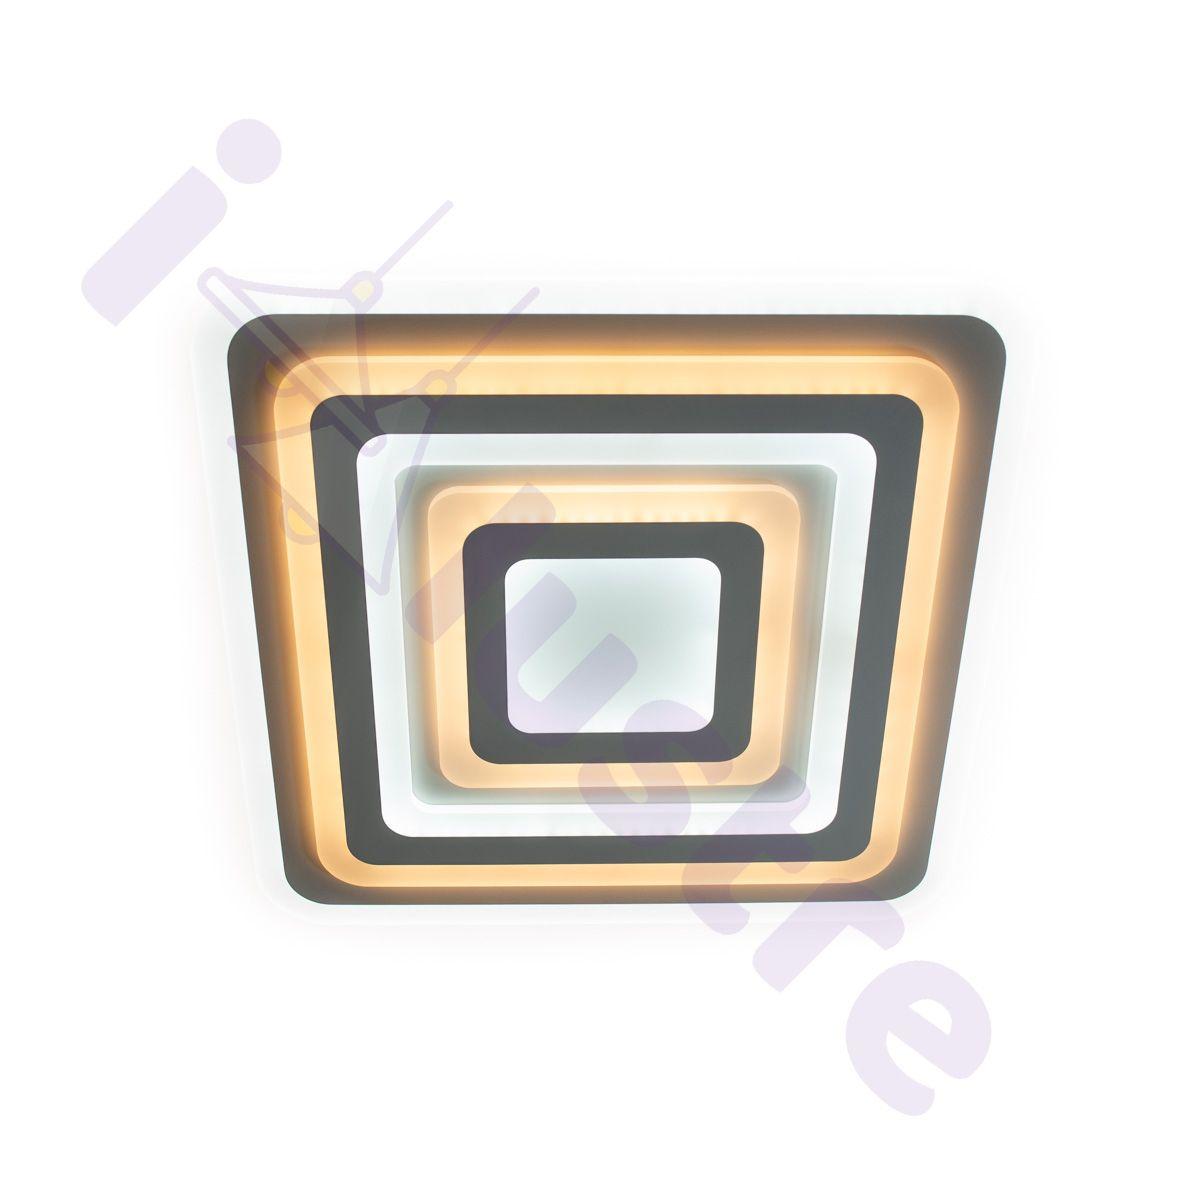 Plafoniera LED LEDO Light, Alb, LED 176W, Lumina Variabila, Dimabila, 10400 lm